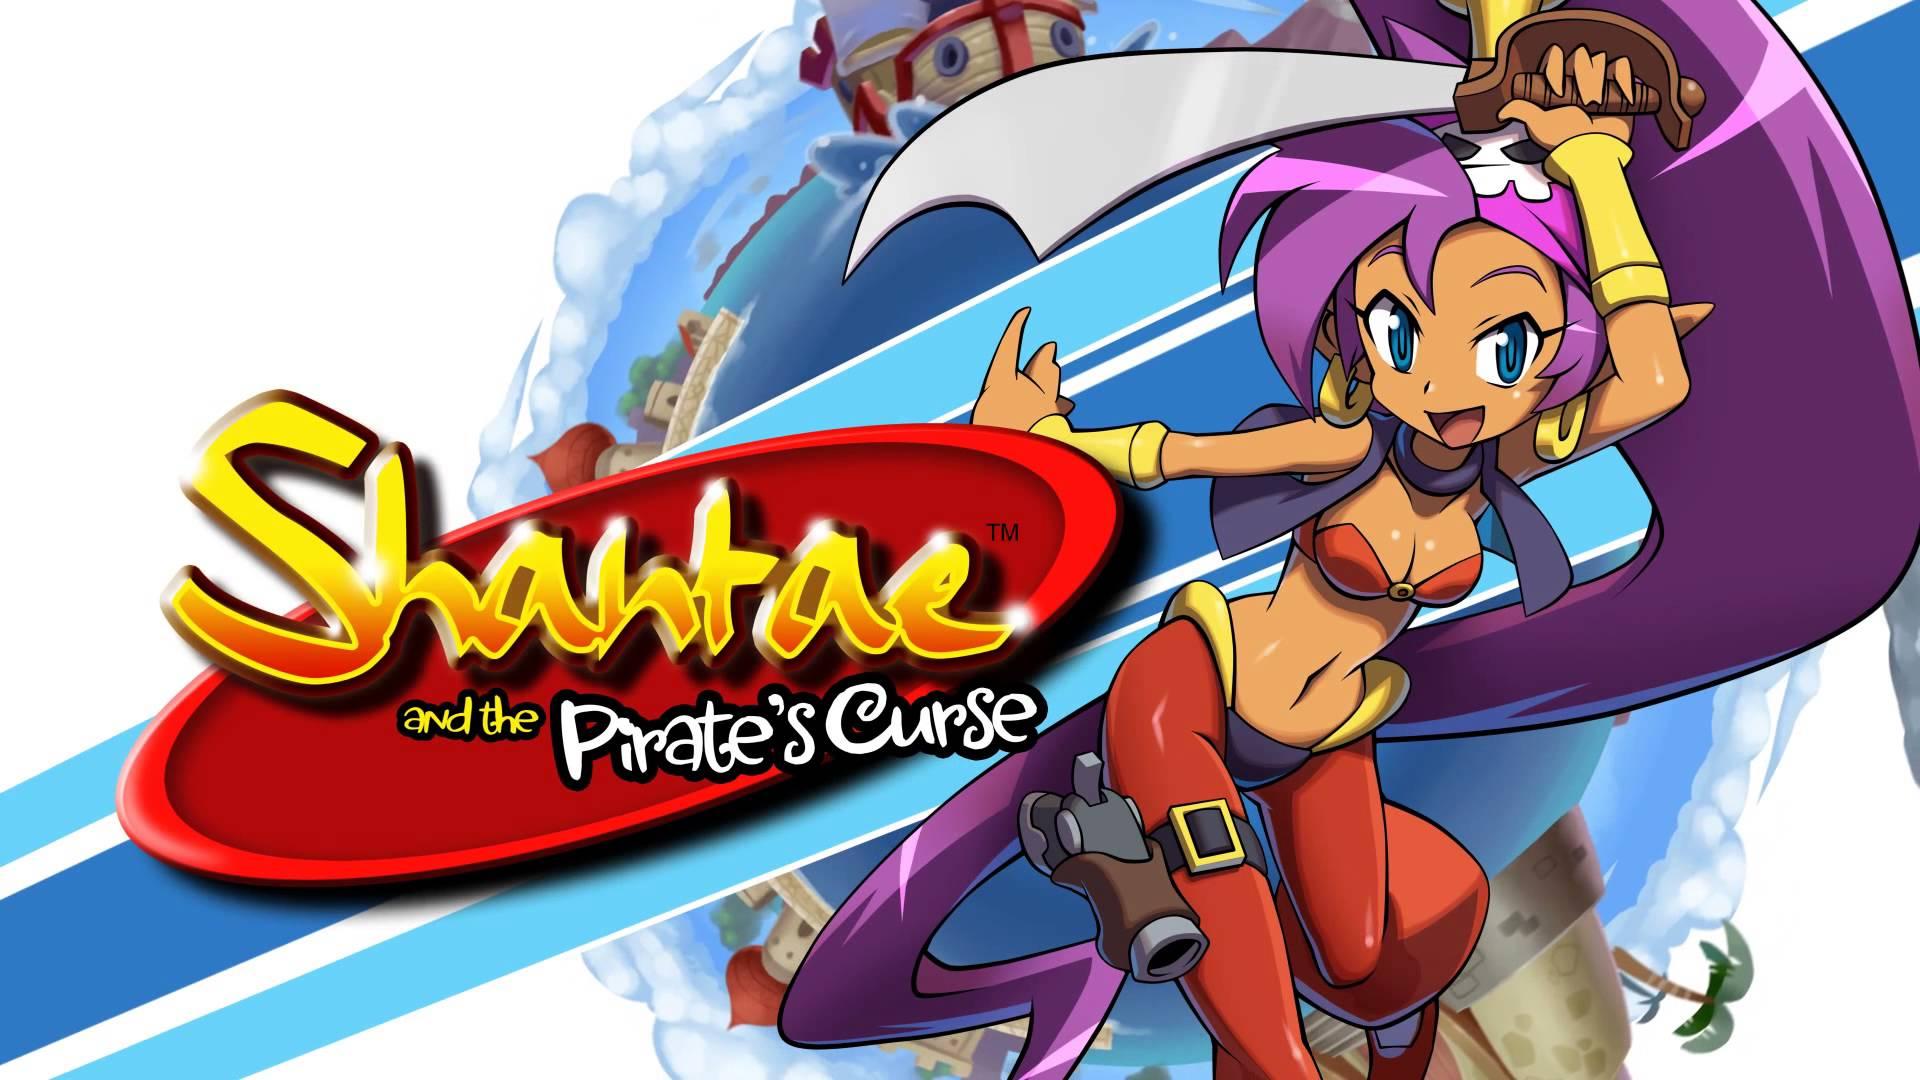 Game Cheats: Shantae and the Pirates Curse | MegaGames